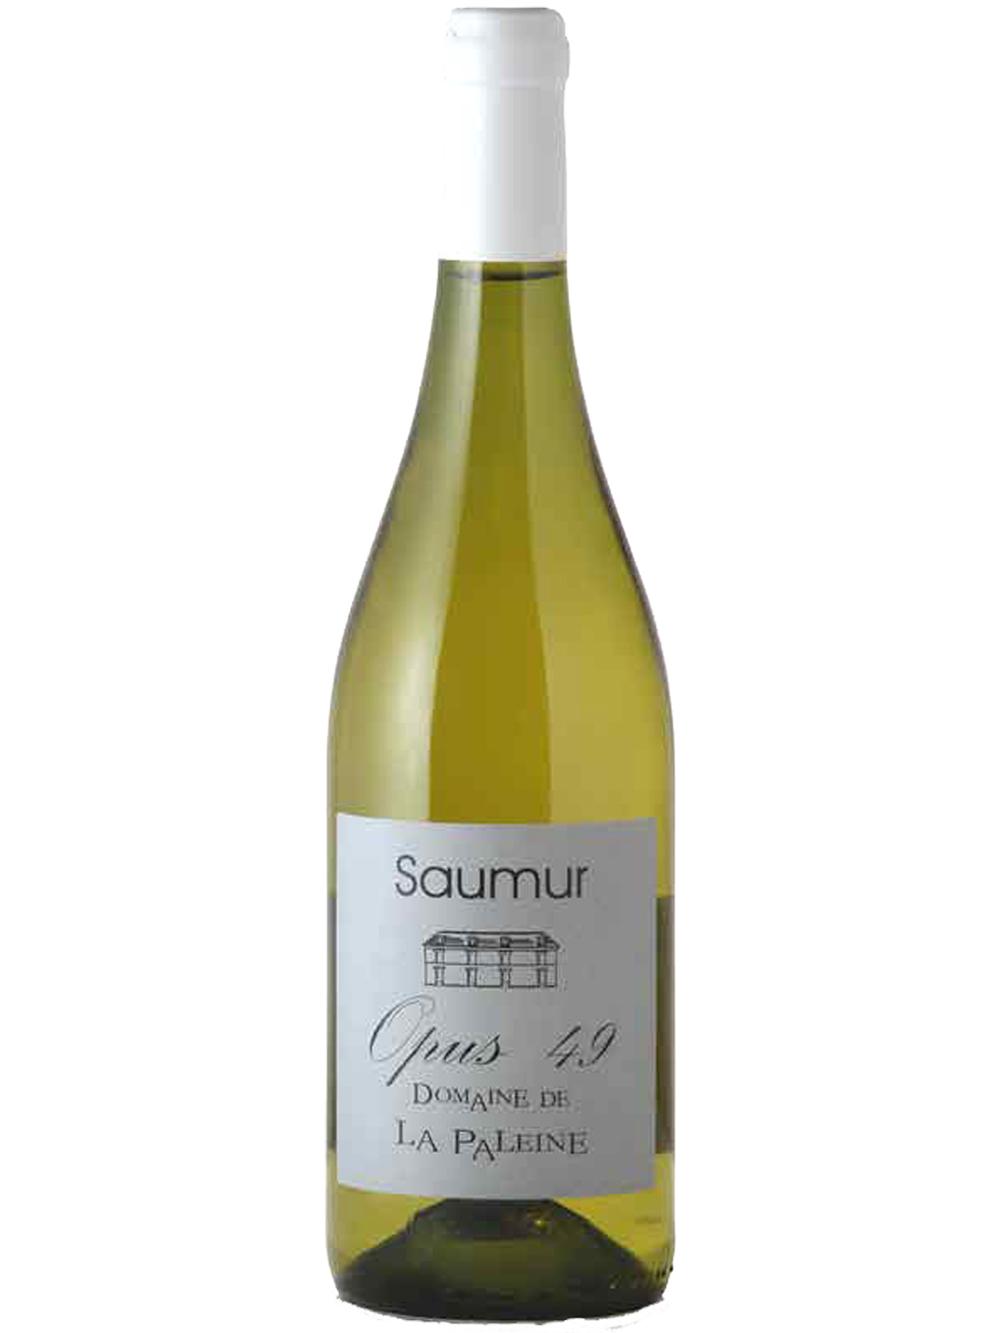 Saumur blanc Opus 49